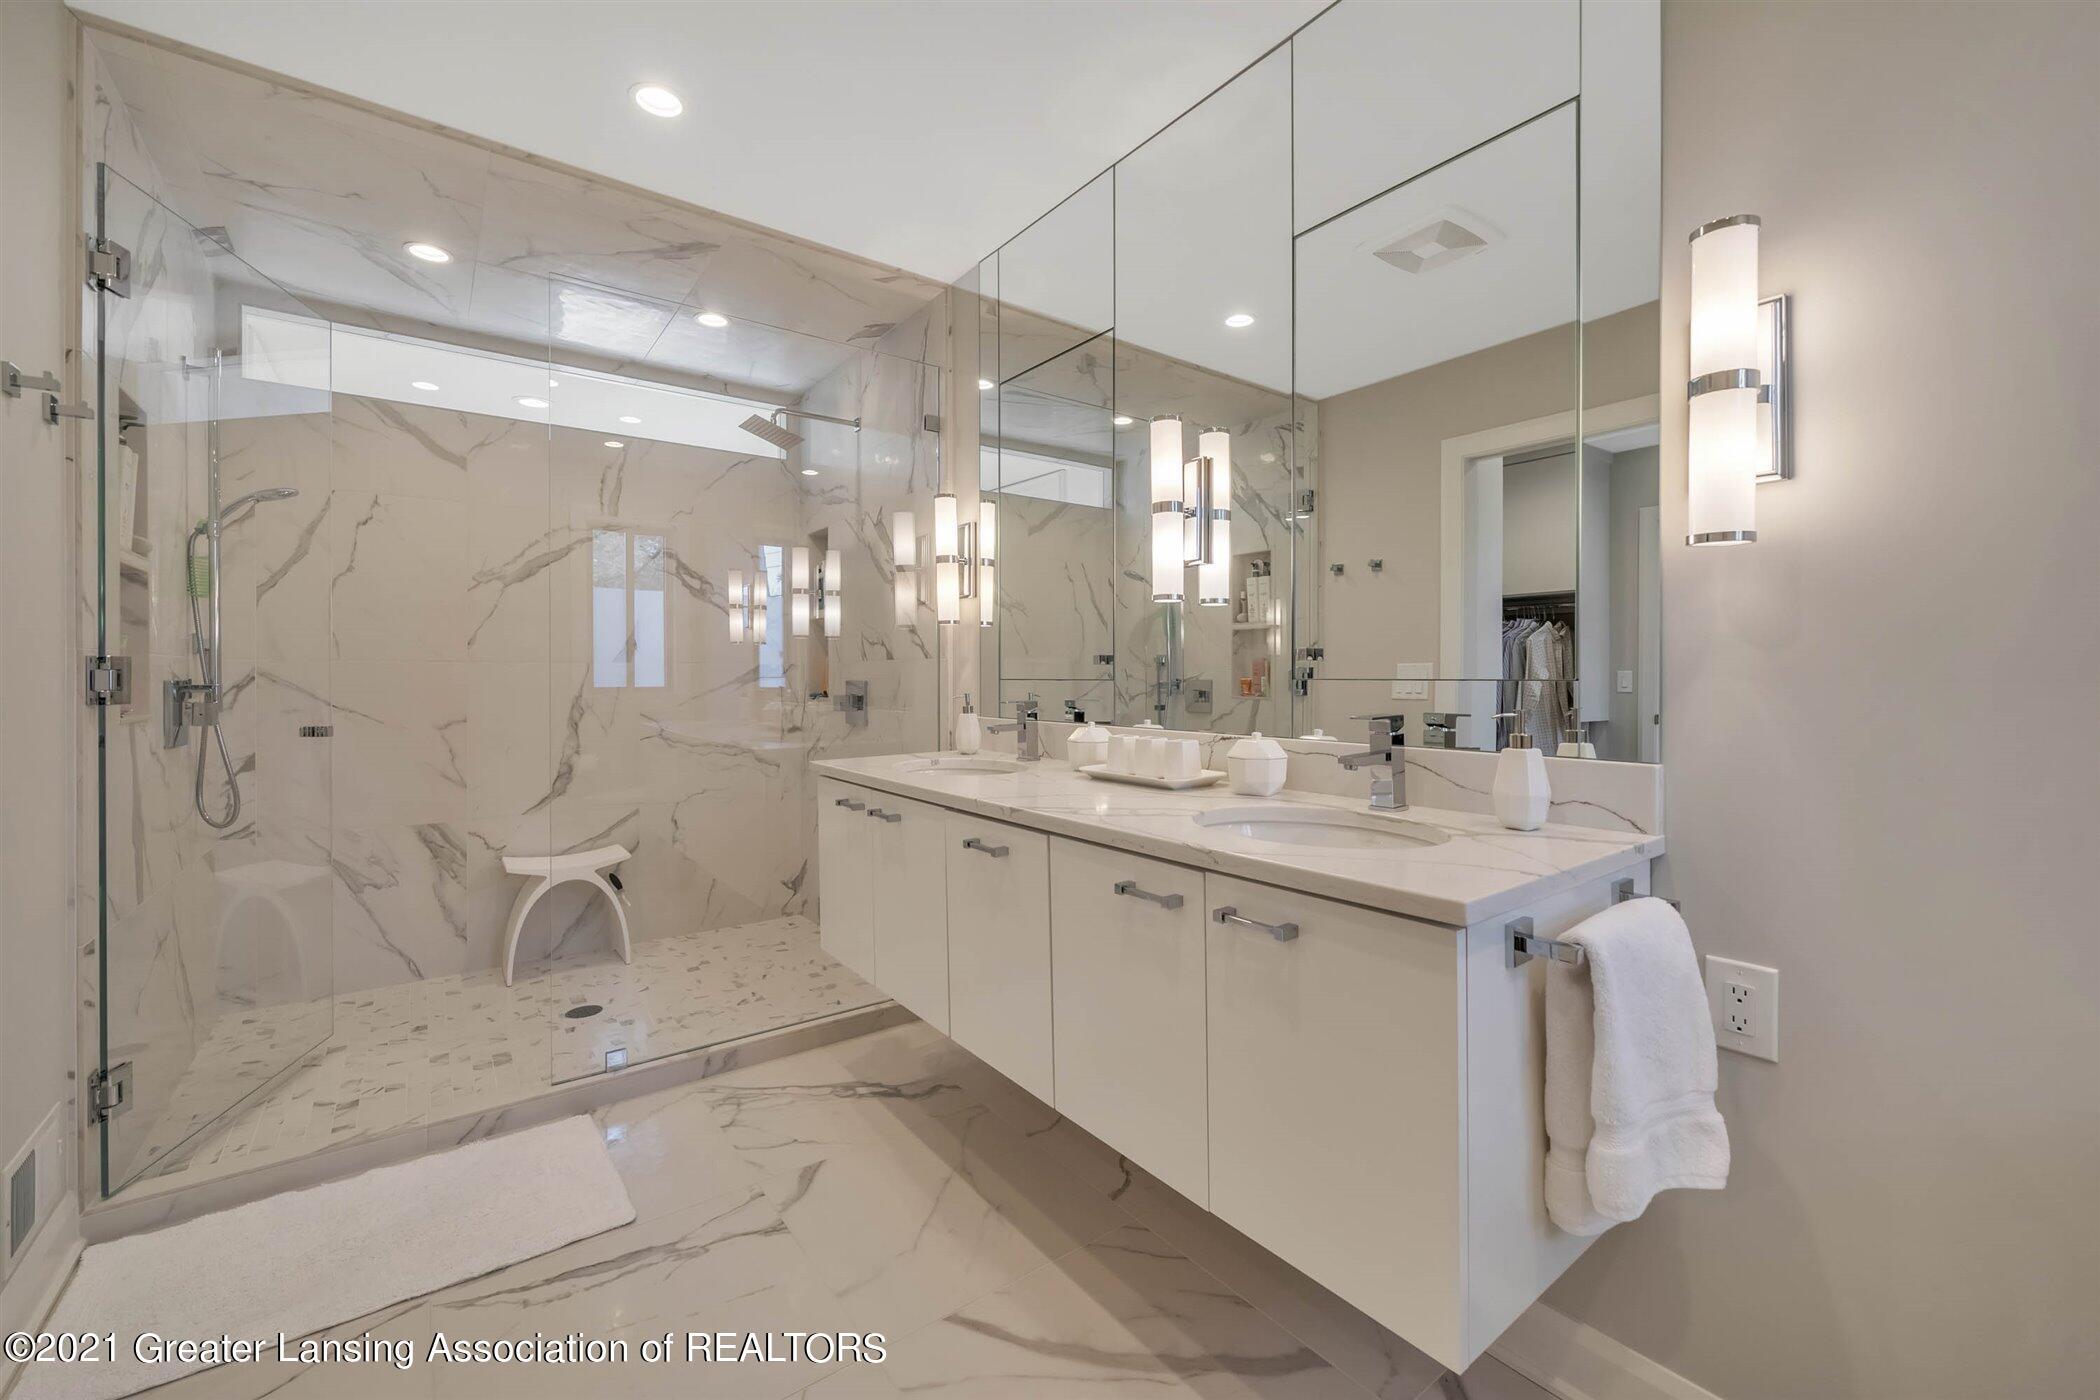 820 Southlawn Ave - MAIN FLOOR Primary Bathroom - 23